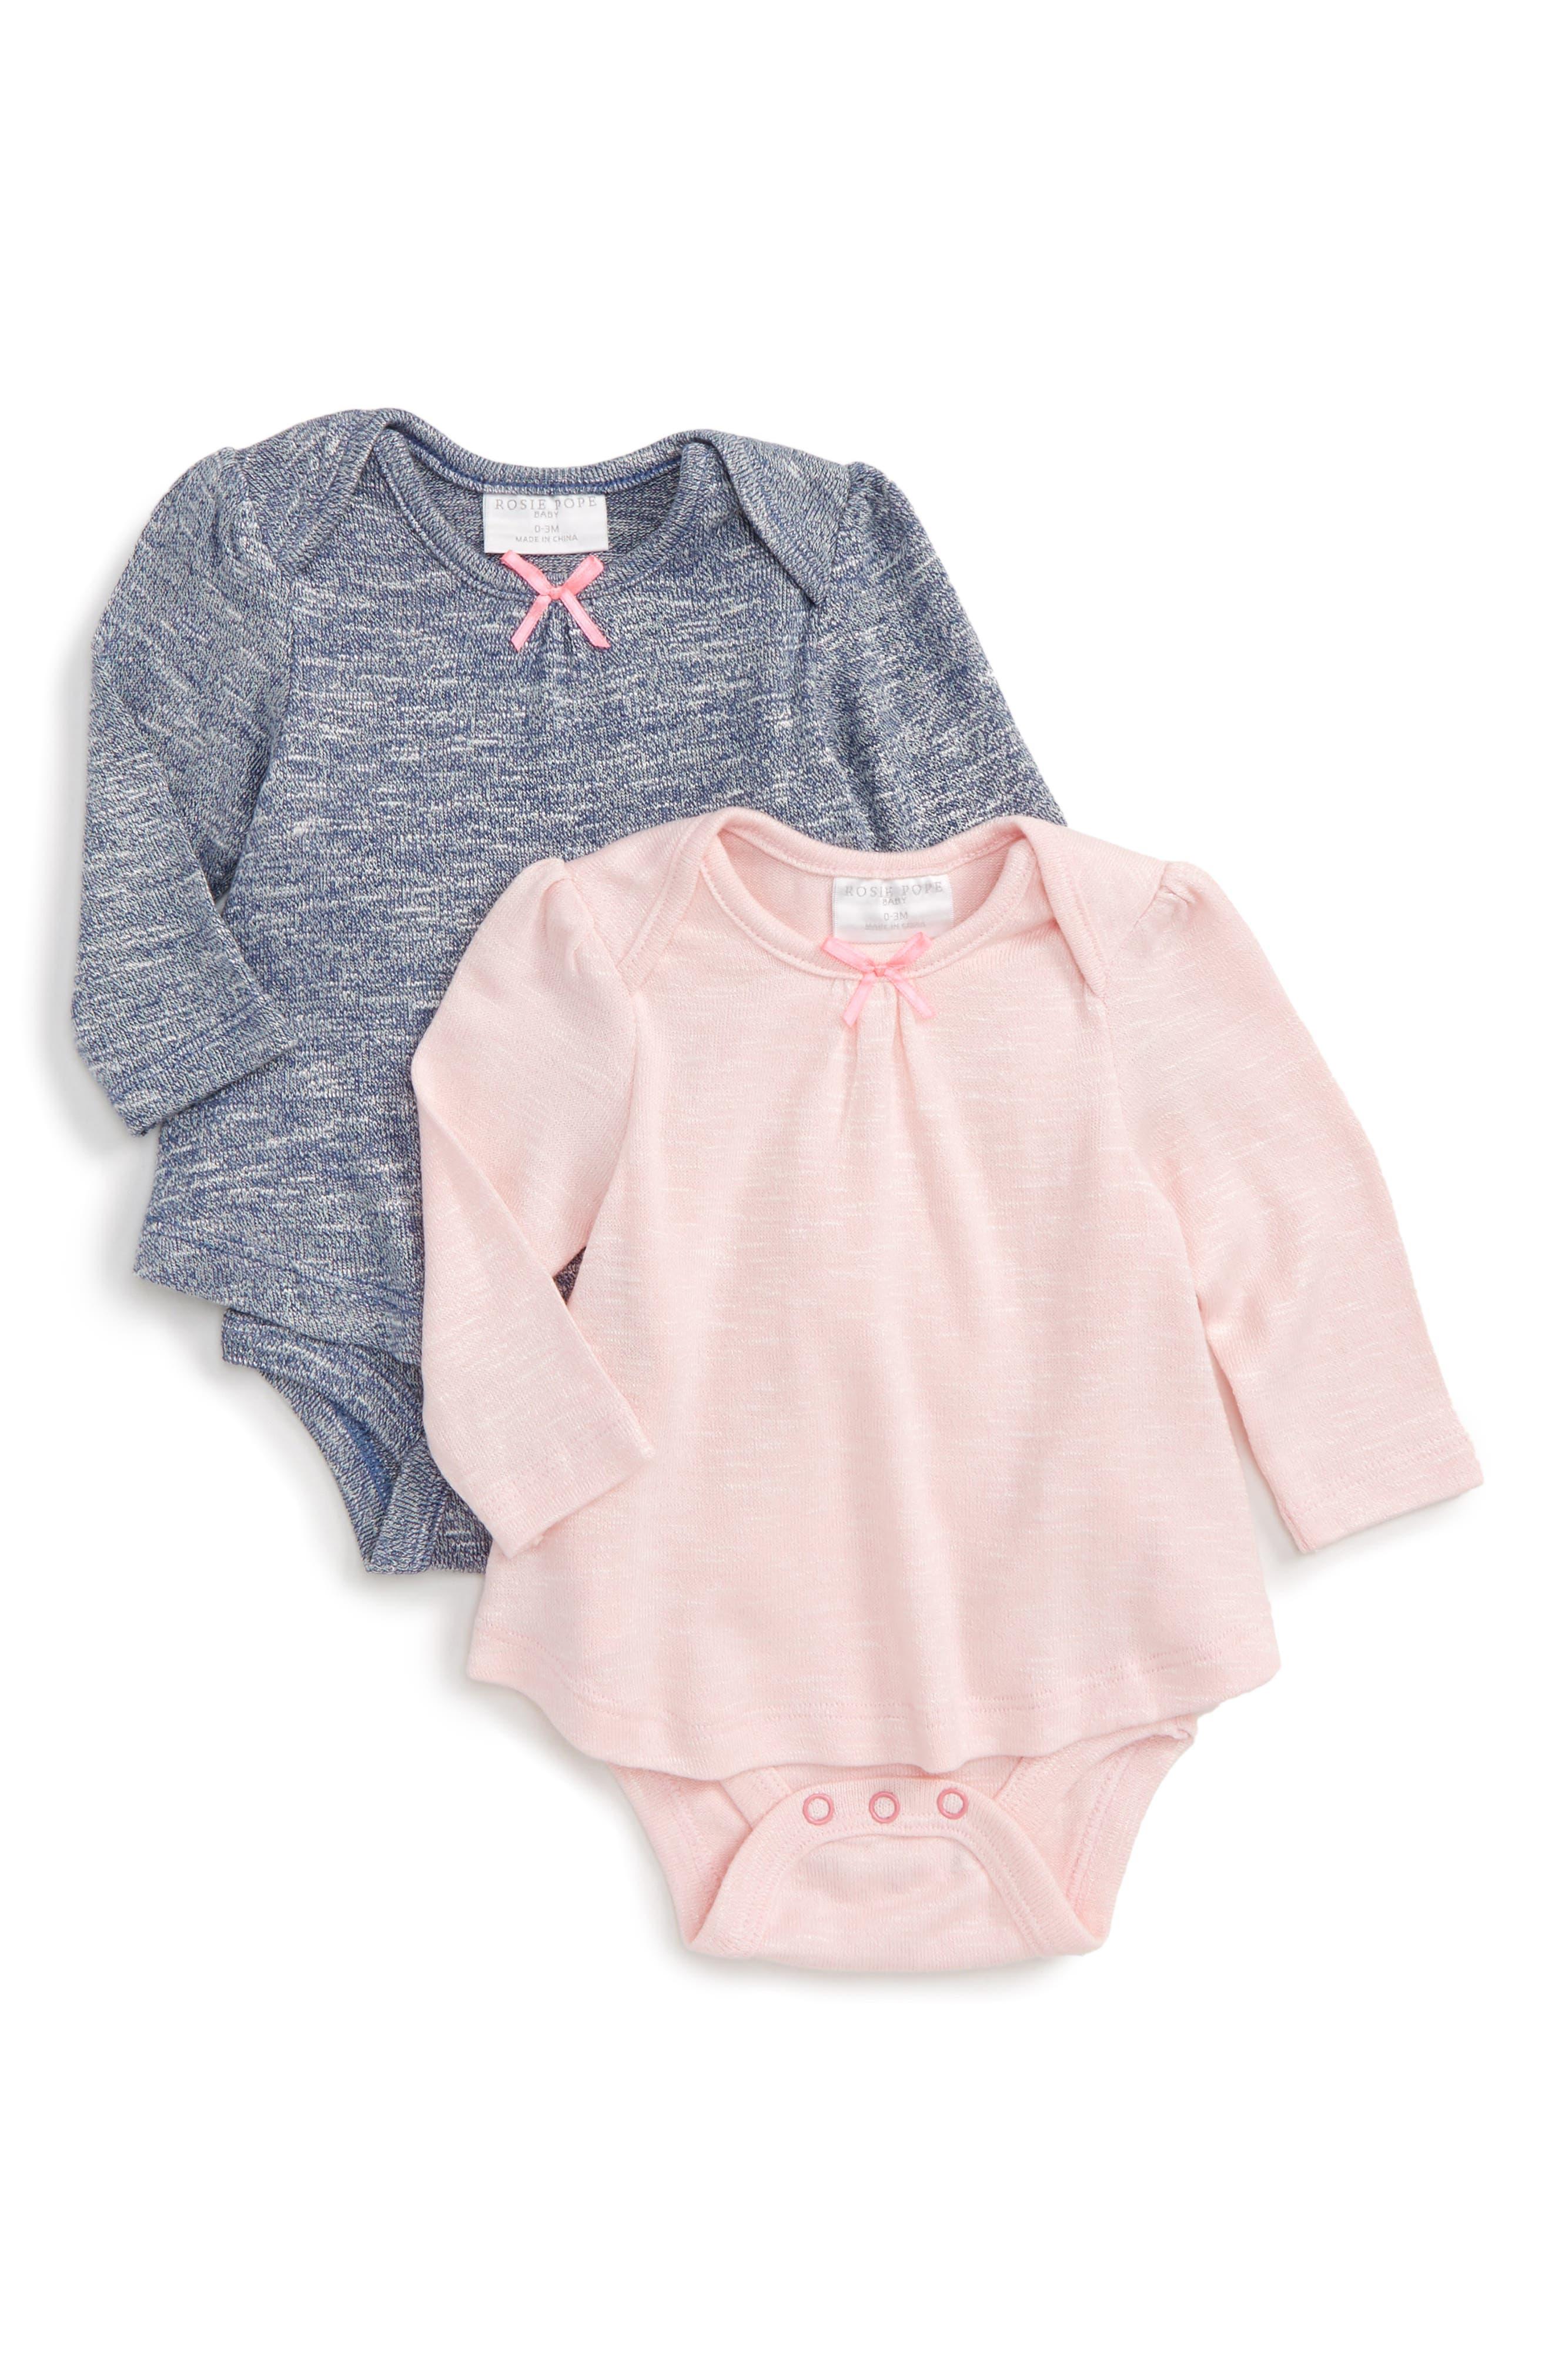 2-Pack Knit Bodysuits,                             Main thumbnail 1, color,                             461